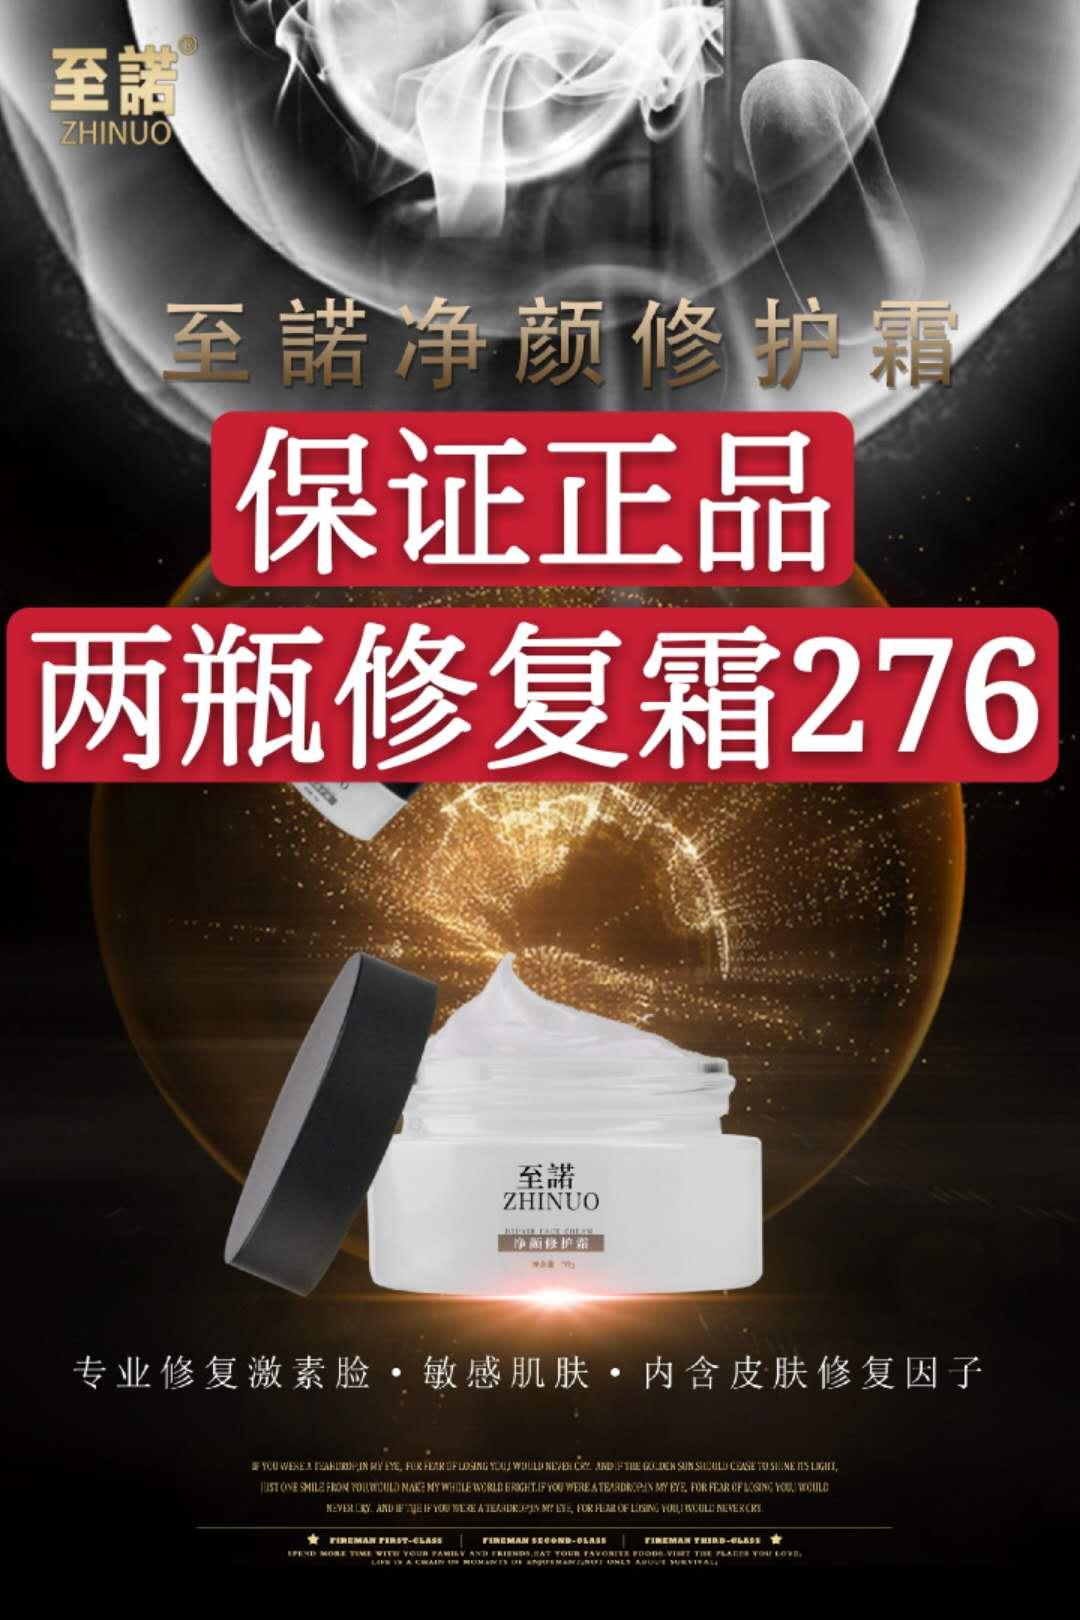 Zhinuo cosmetics, genuine skin care, cleansing and repairing cream, professional repairing hormone, blush, blood silk, sensitive muscle 276